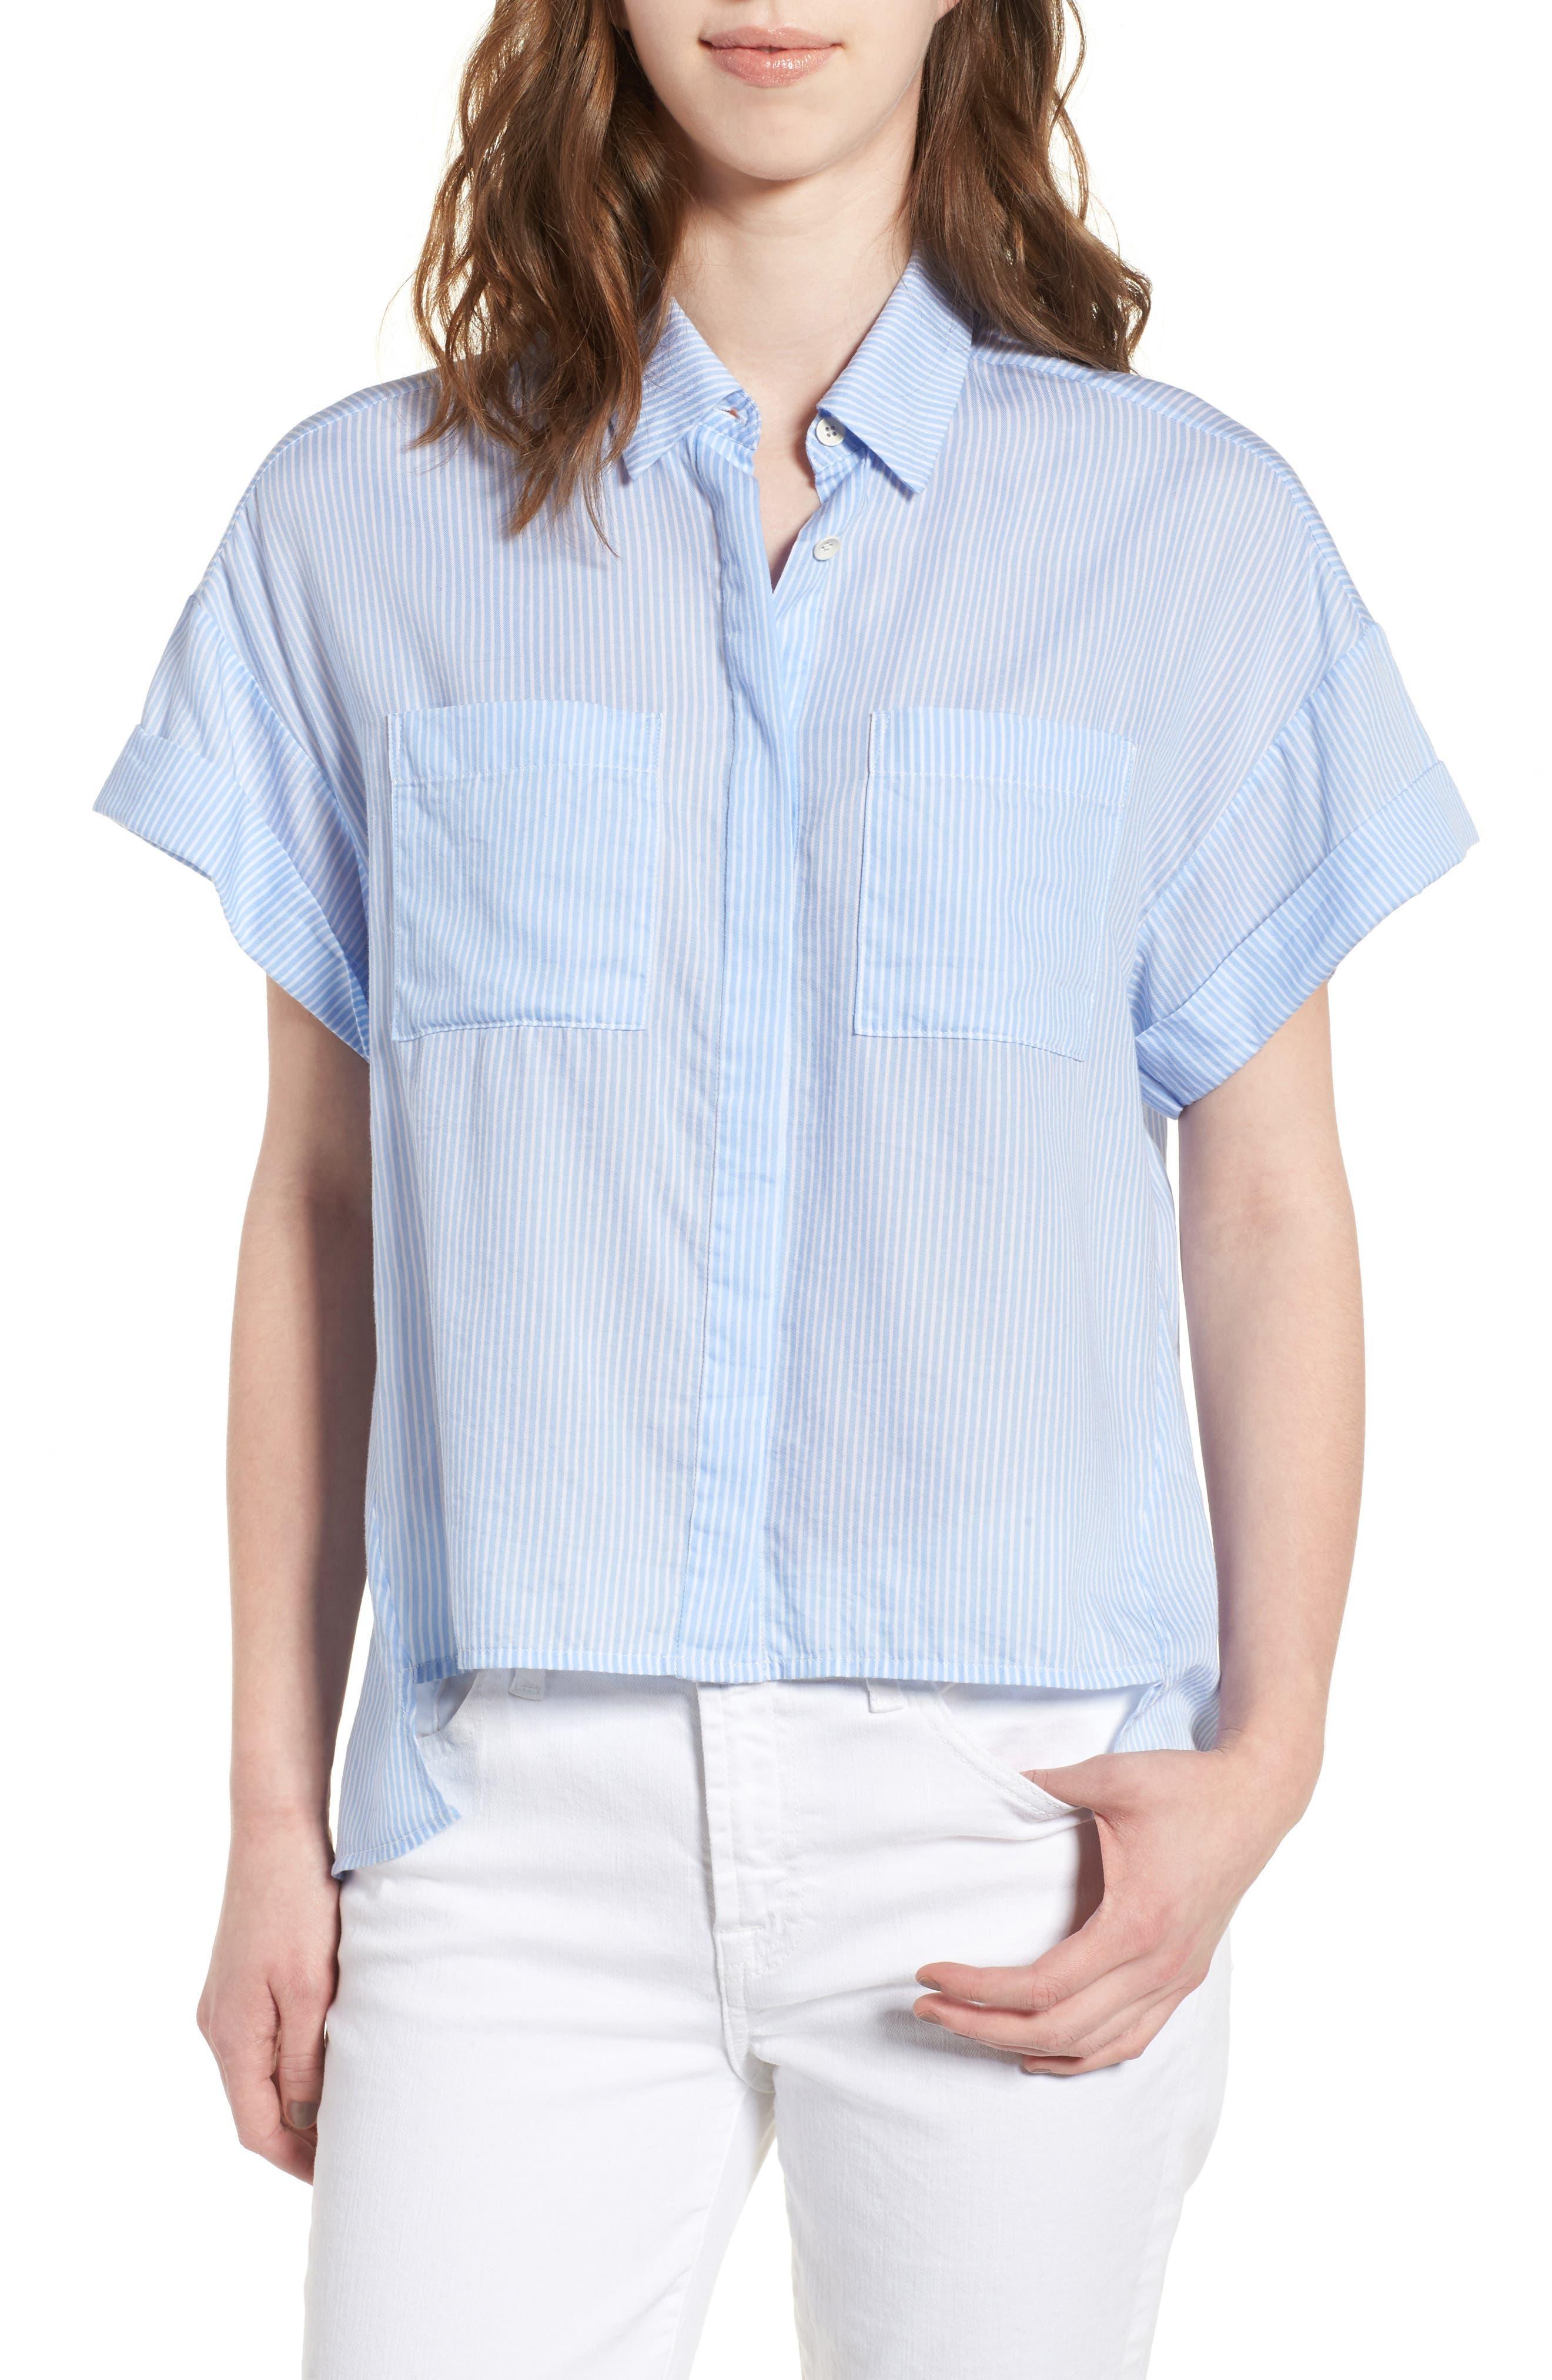 DL1961 Bridgeport High/Low Shirt